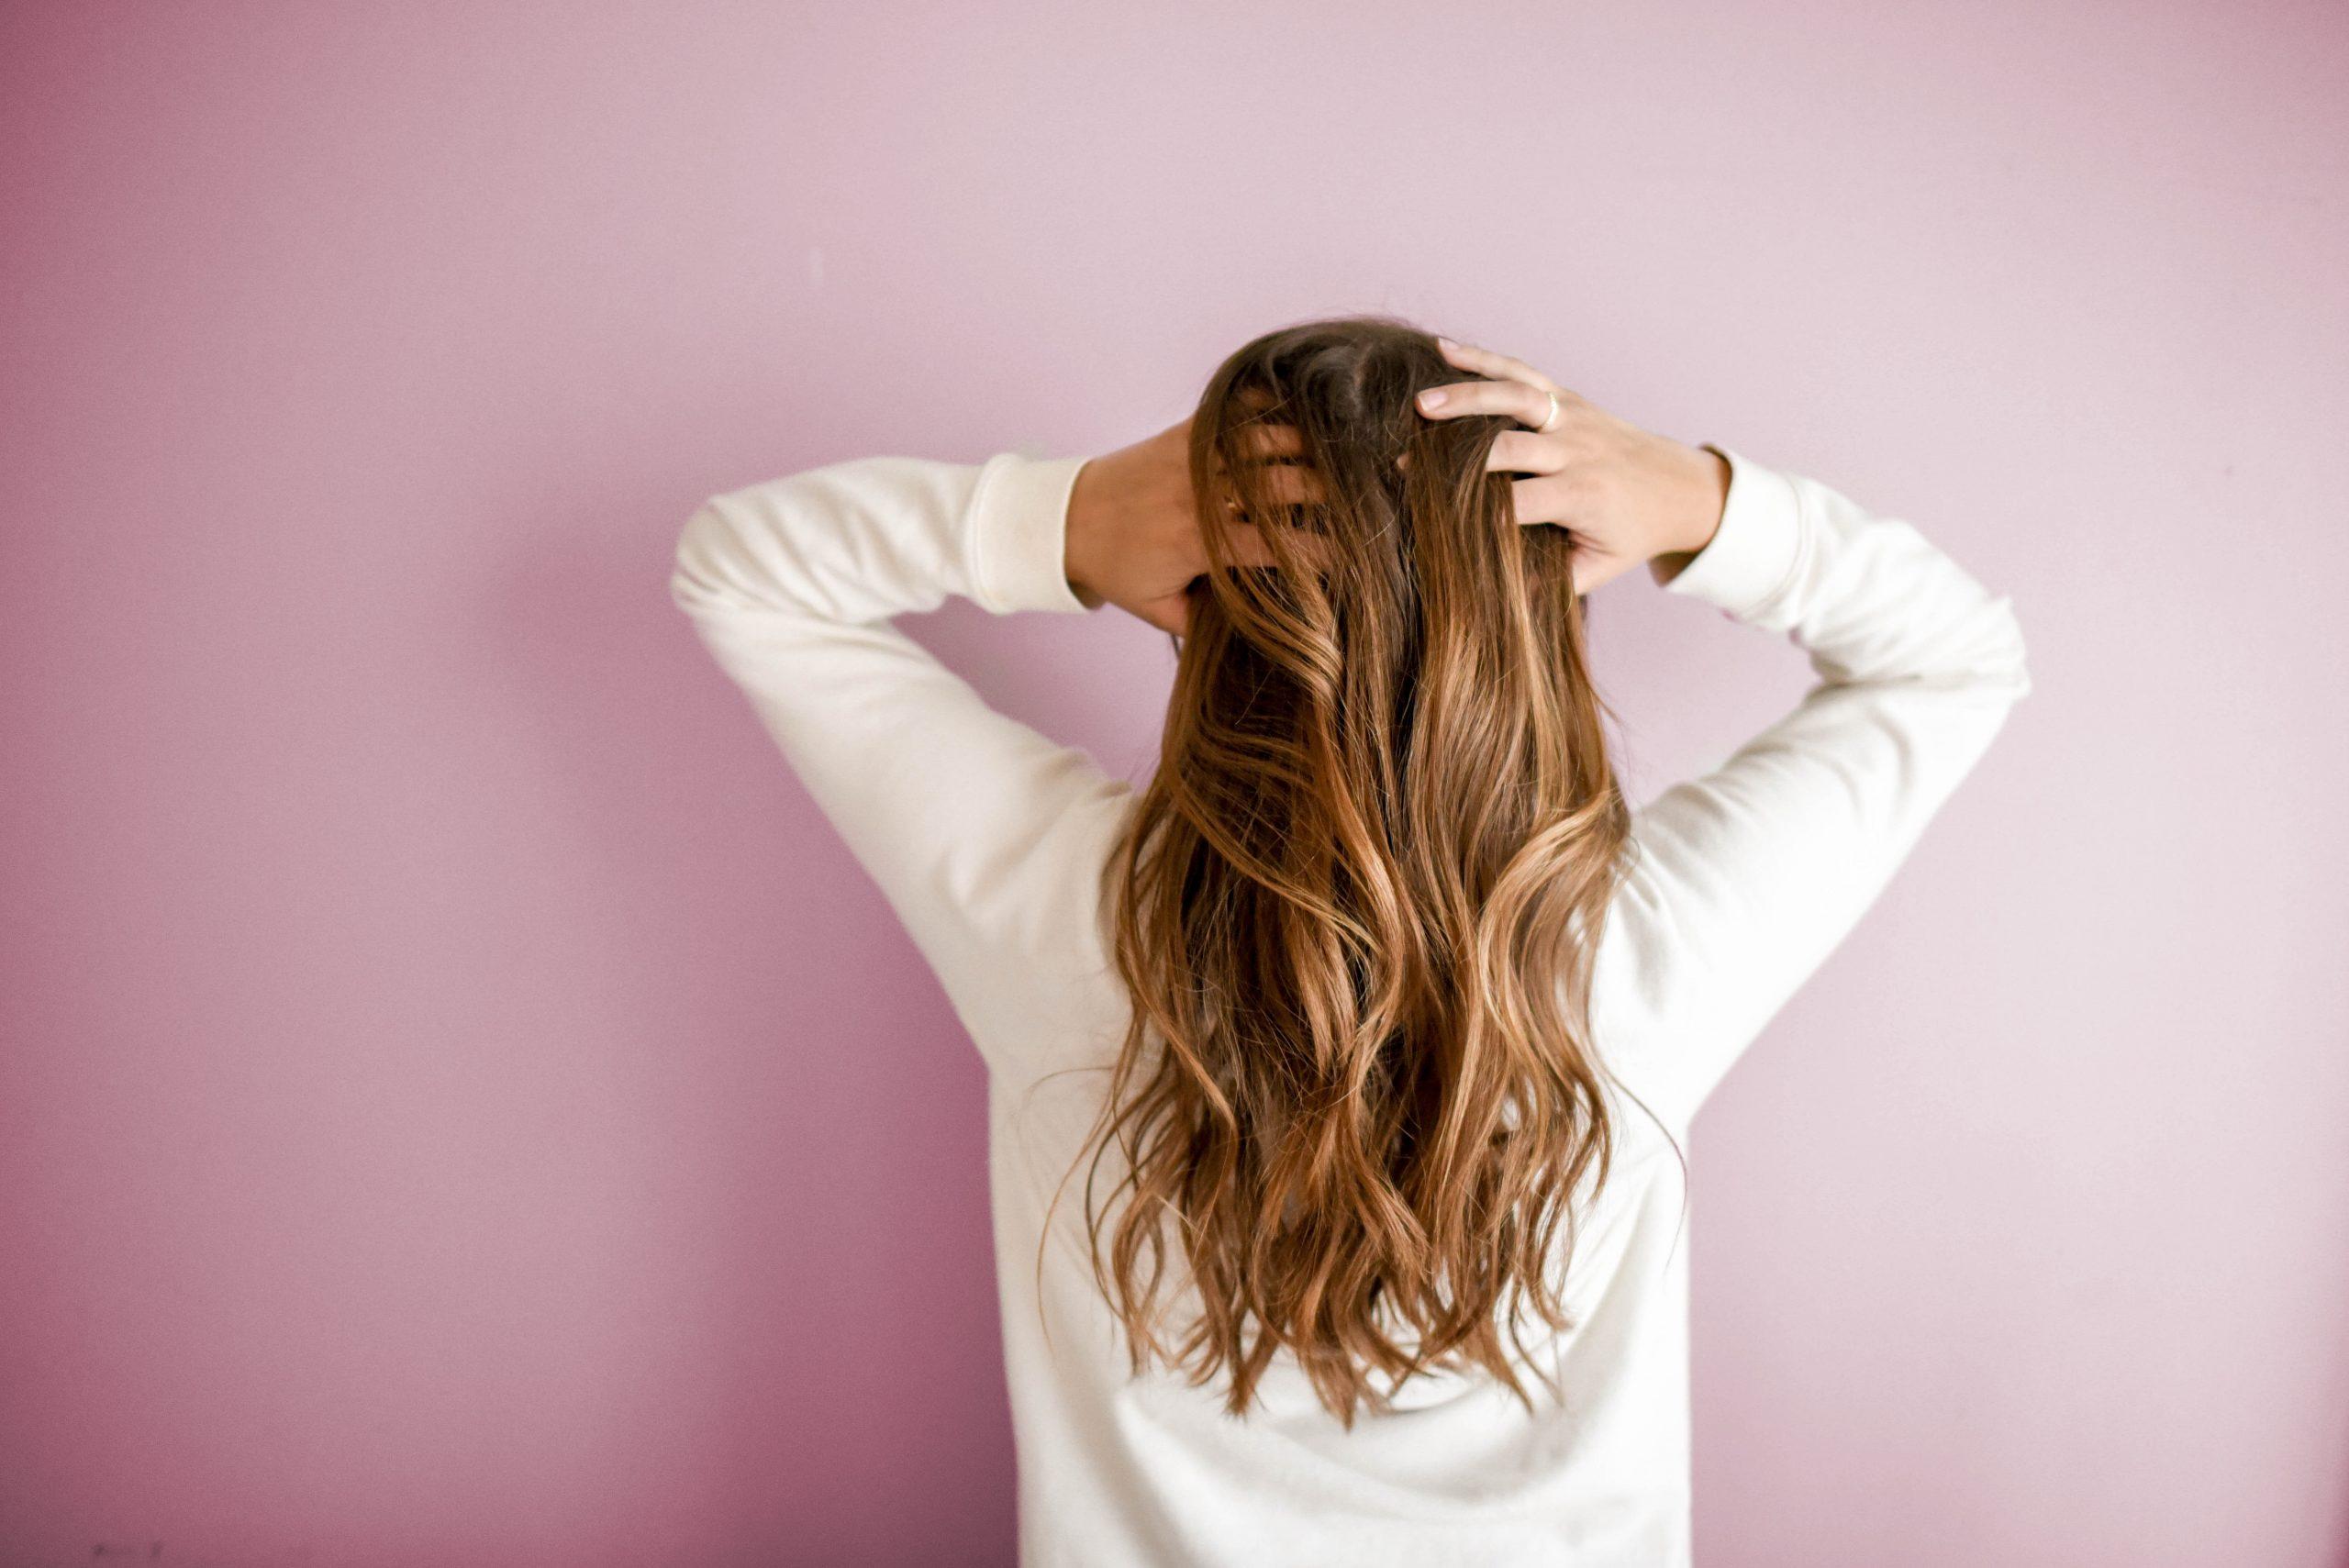 איך מונעים נשירת שיער